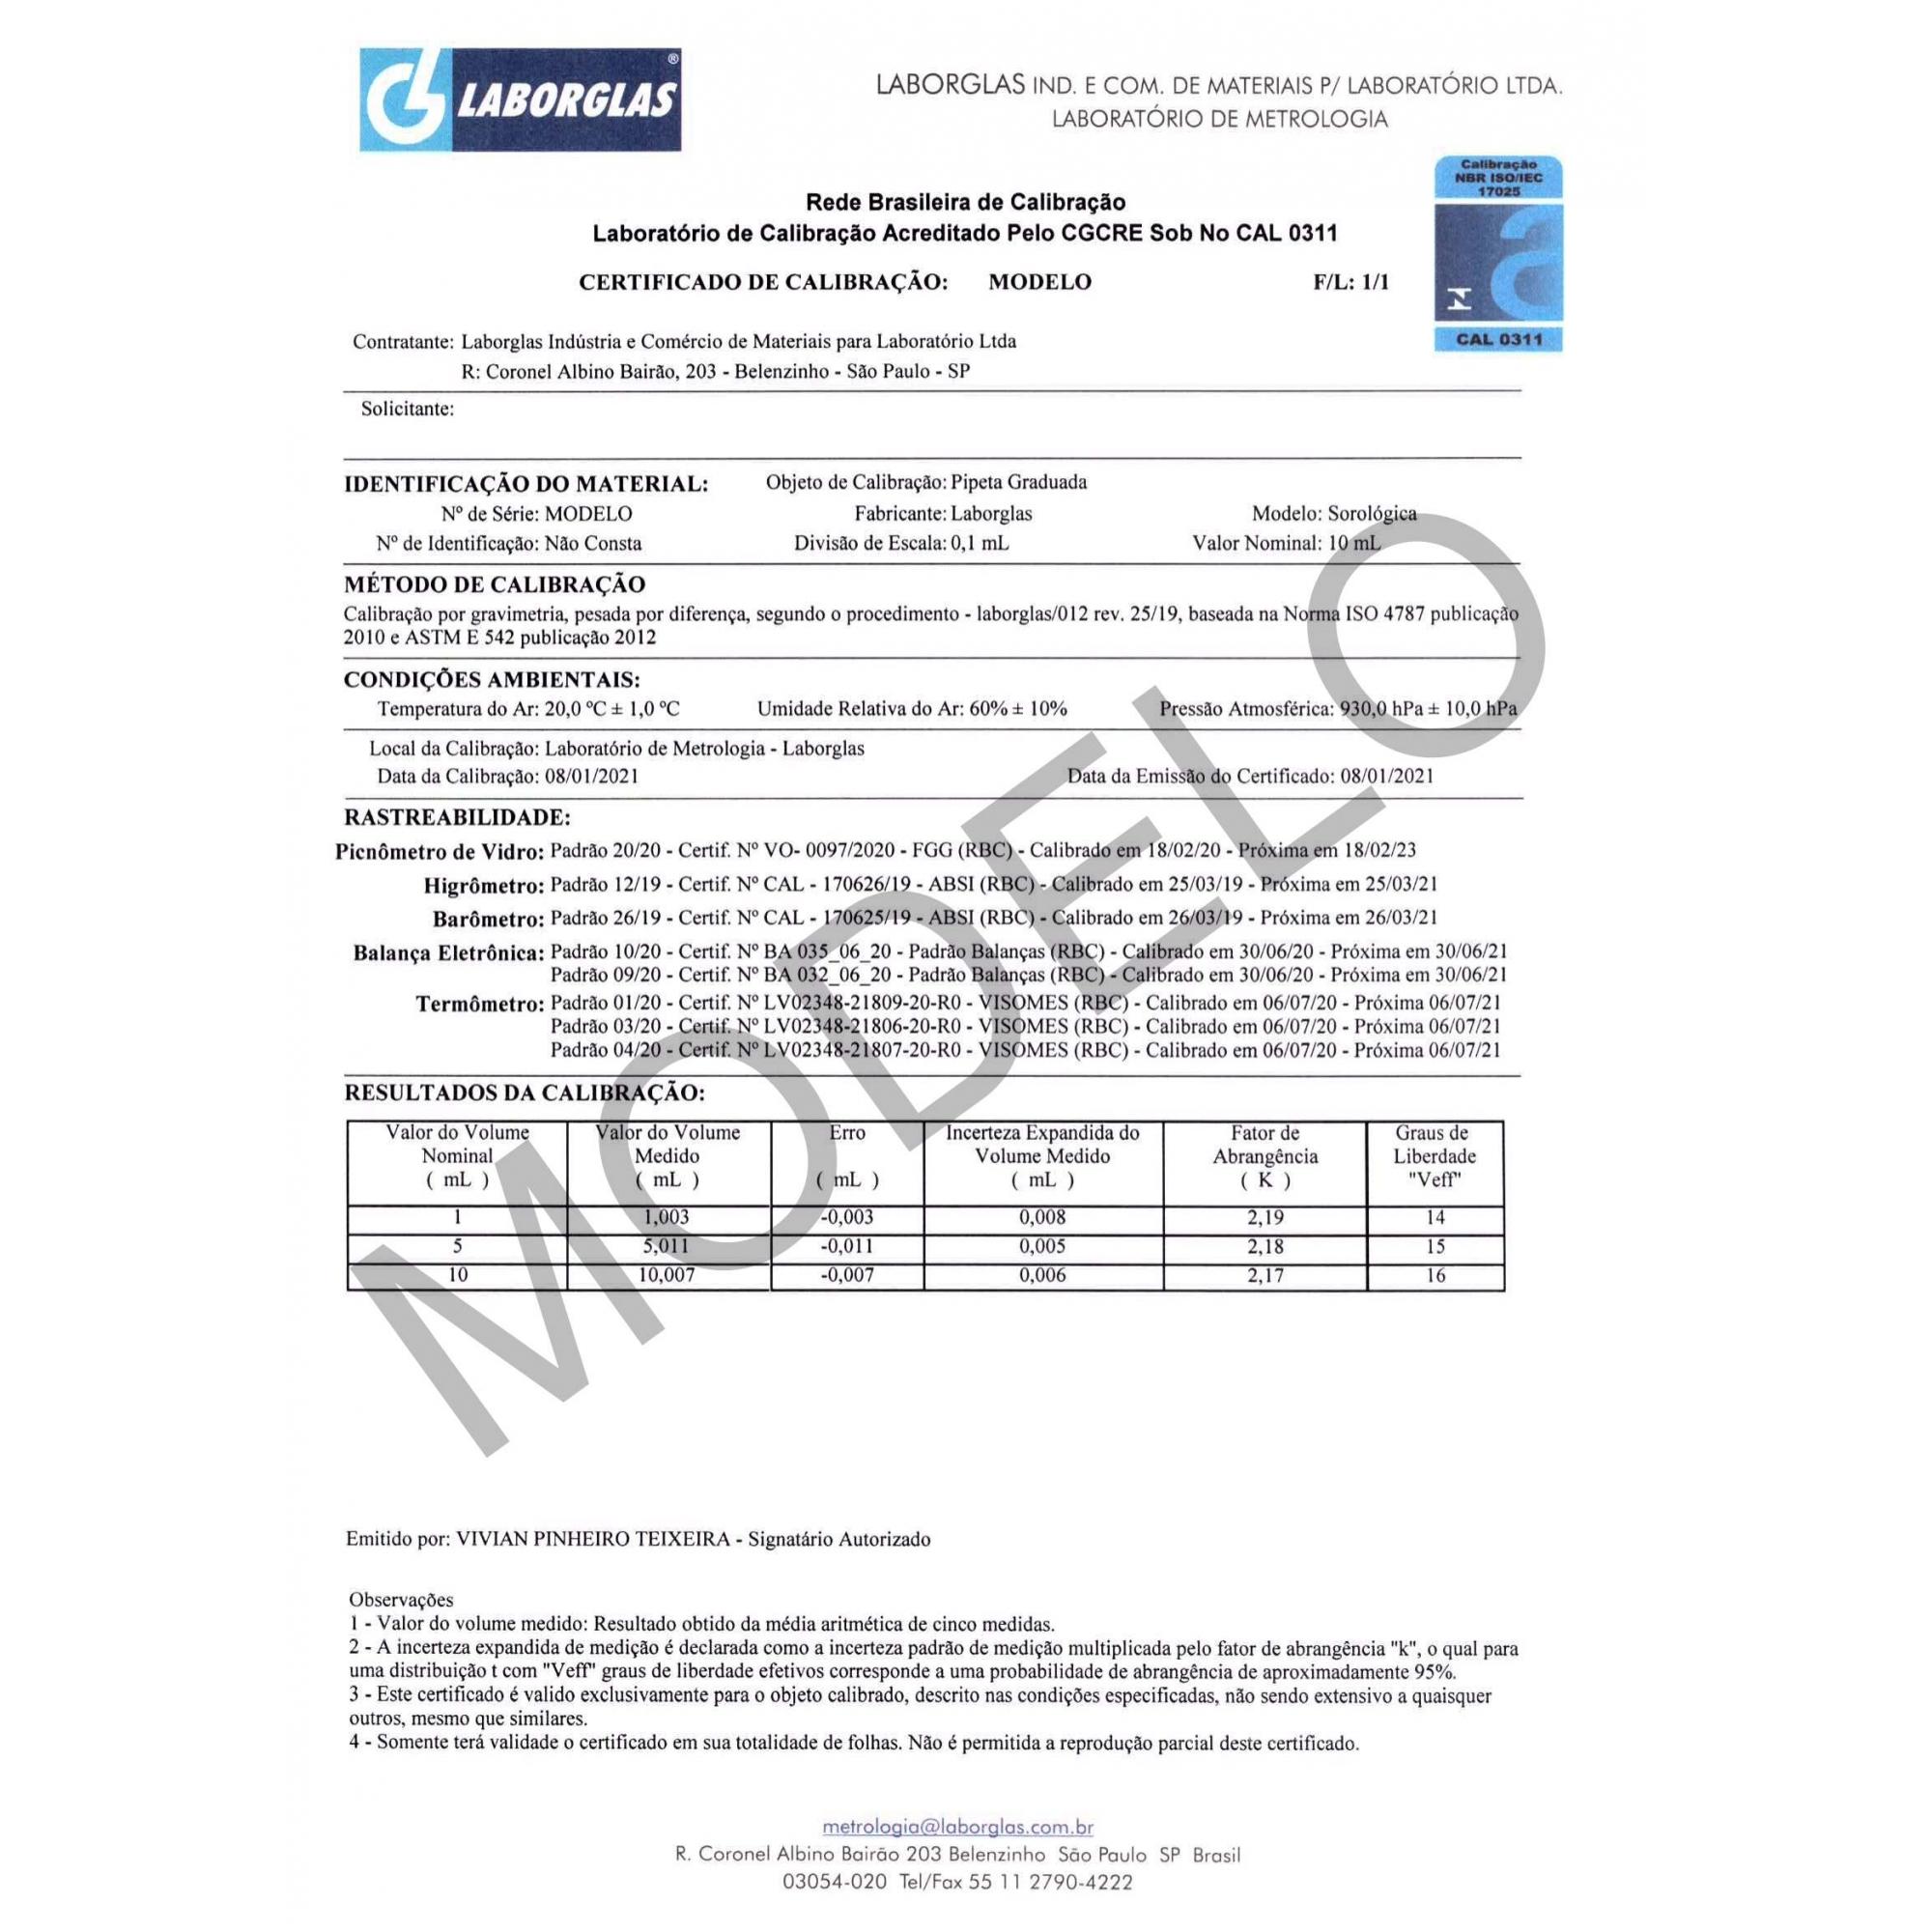 PIPETA GRAD. SOROL. ESGOT. TOTAL 0,5 ML 1/100 COM CERTIFICADO RBC - Laborglas - Cód. 9434305-R